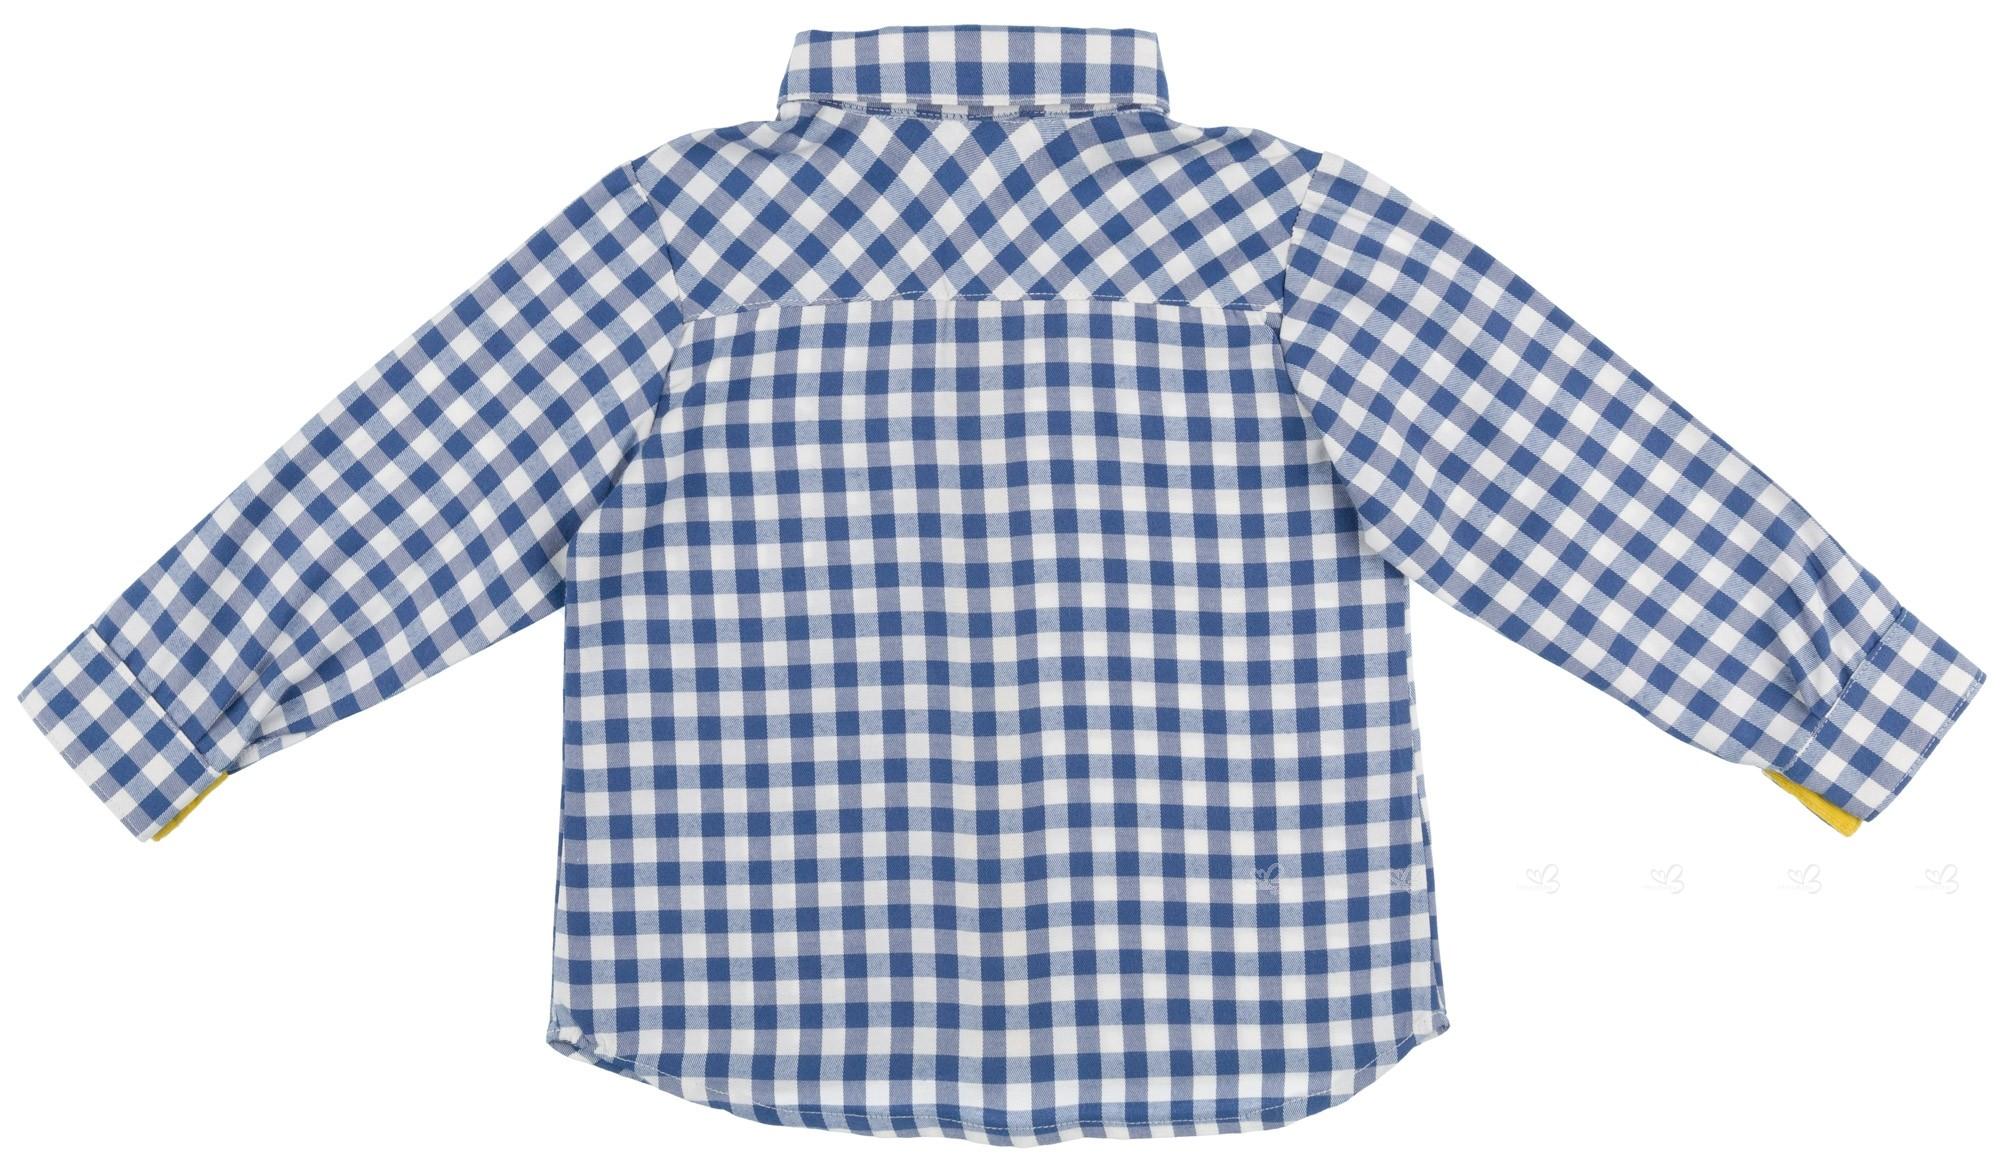 04745884 Rochy Boys Blue Gingham Shirt & Trousers Set | Missbaby